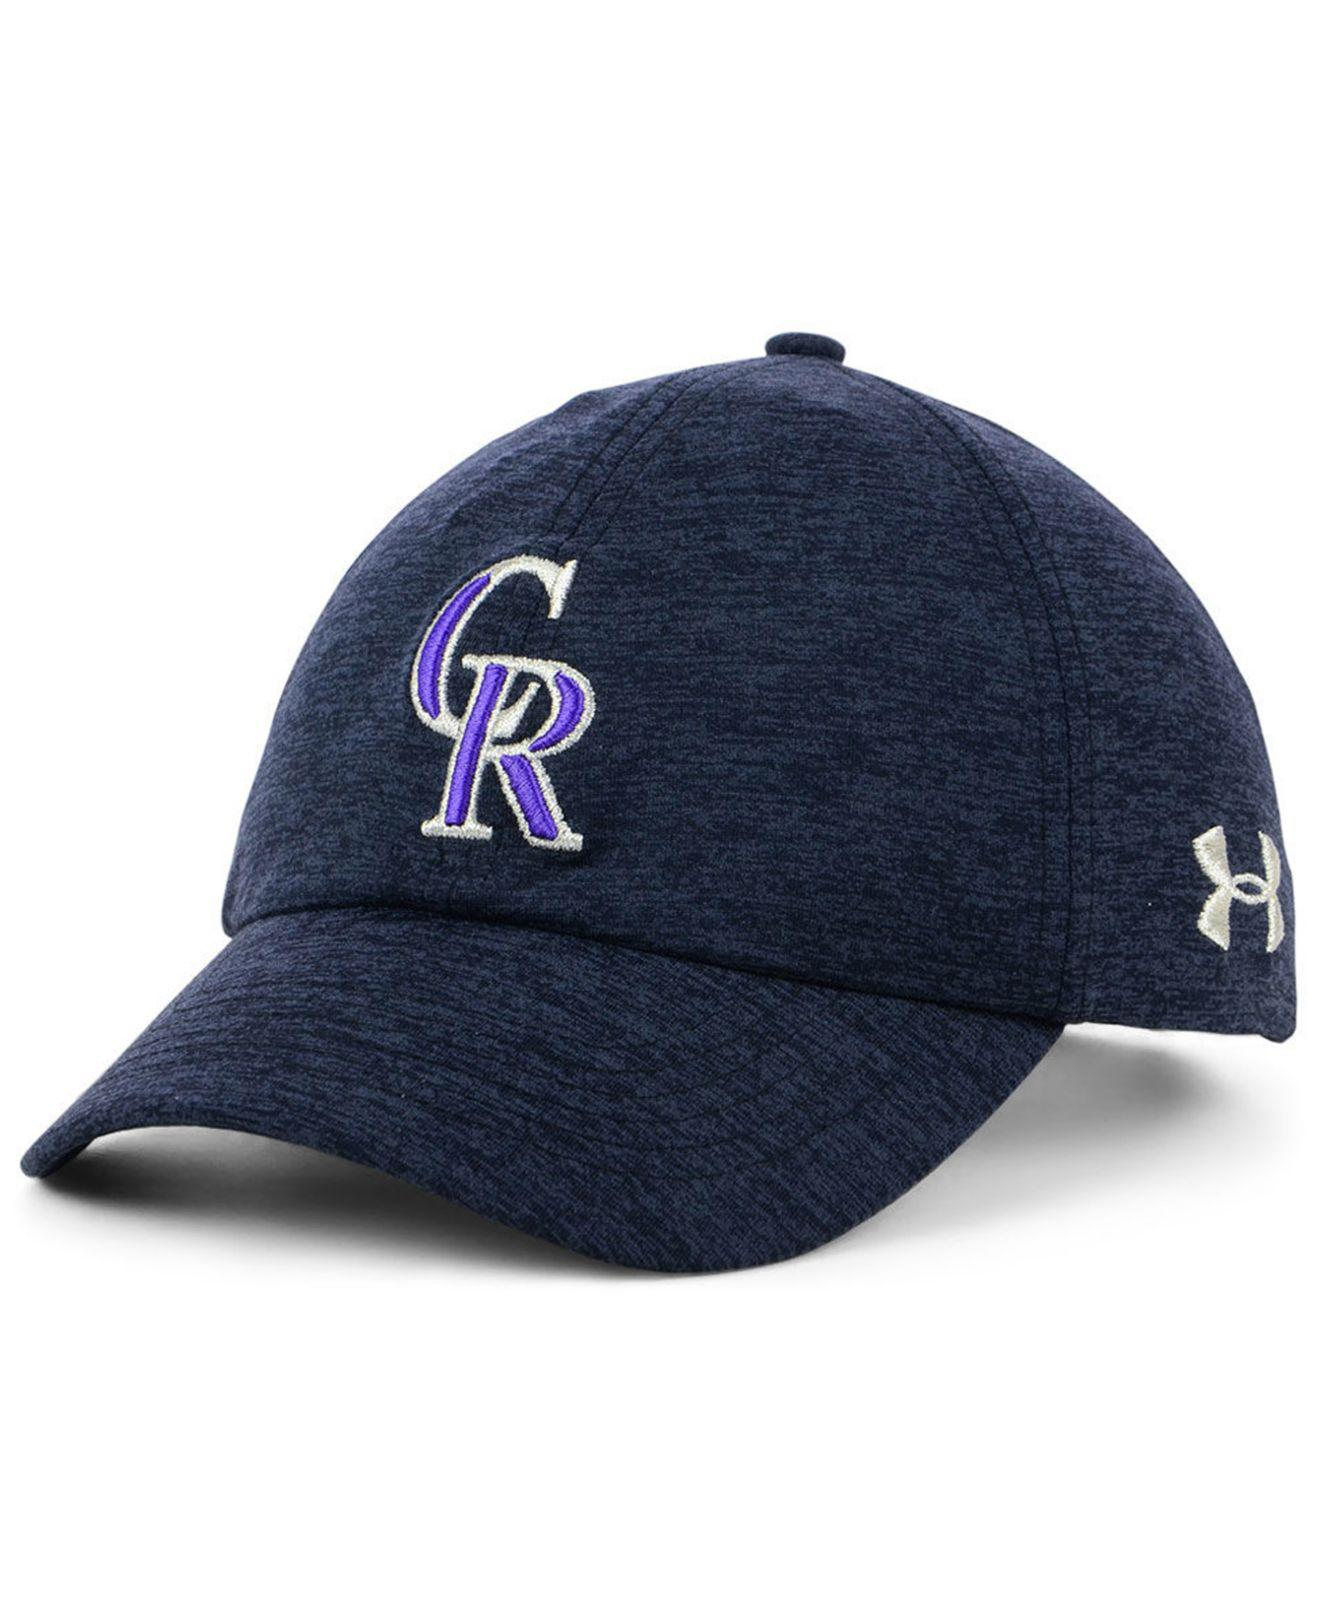 low priced c2263 a847d new zealand discount colorado rockies hats blackpurple id6611711 8925e  d39c6  greece under armour. womens blue colorado rockies renegade twist cap  0d401 ...